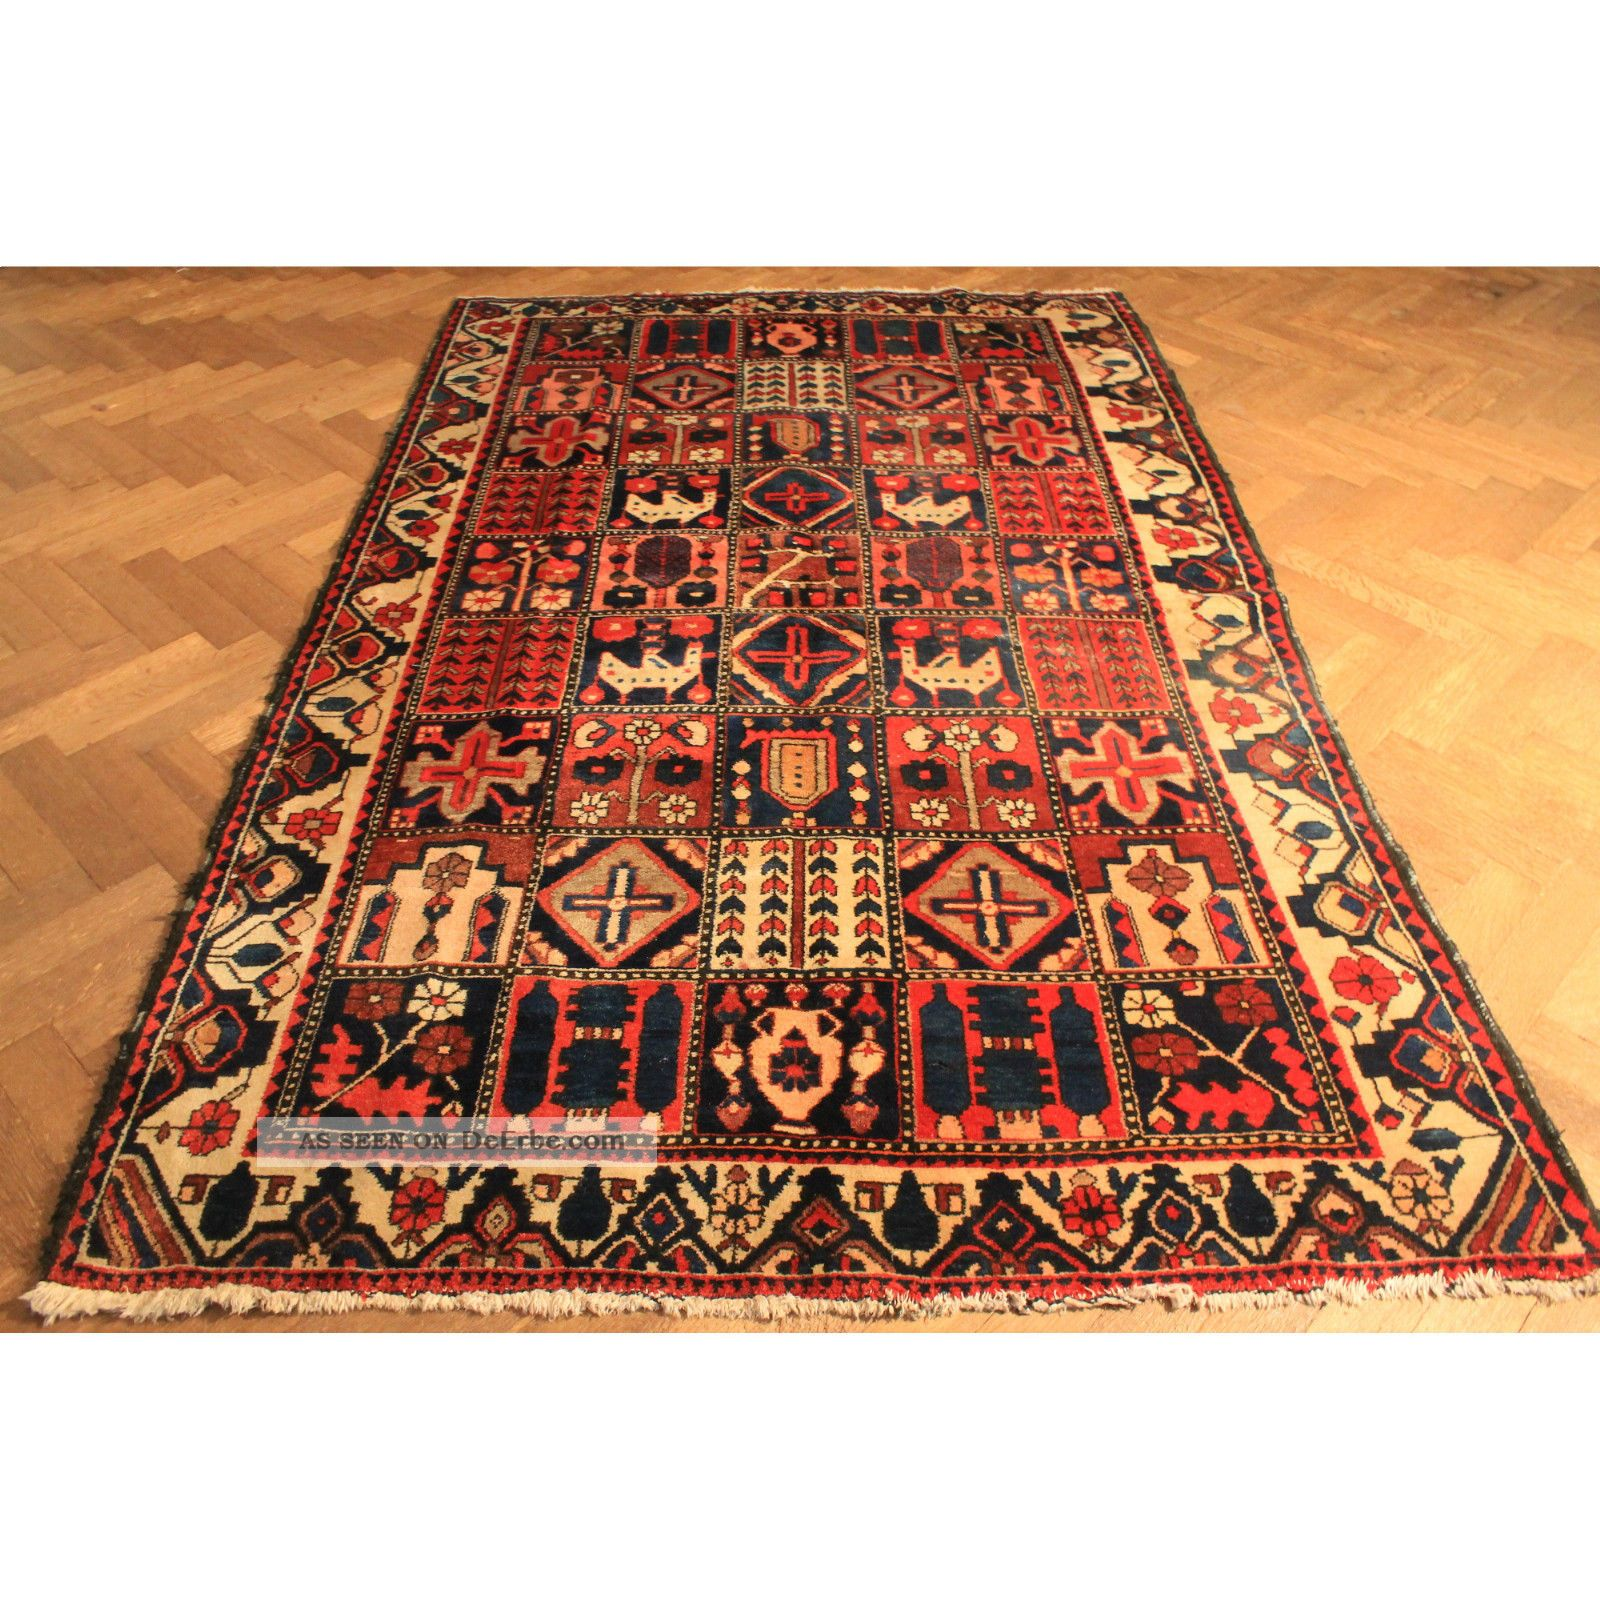 selten antiker handgekn pfter orient perser teppich felder garten bachtiari rug. Black Bedroom Furniture Sets. Home Design Ideas